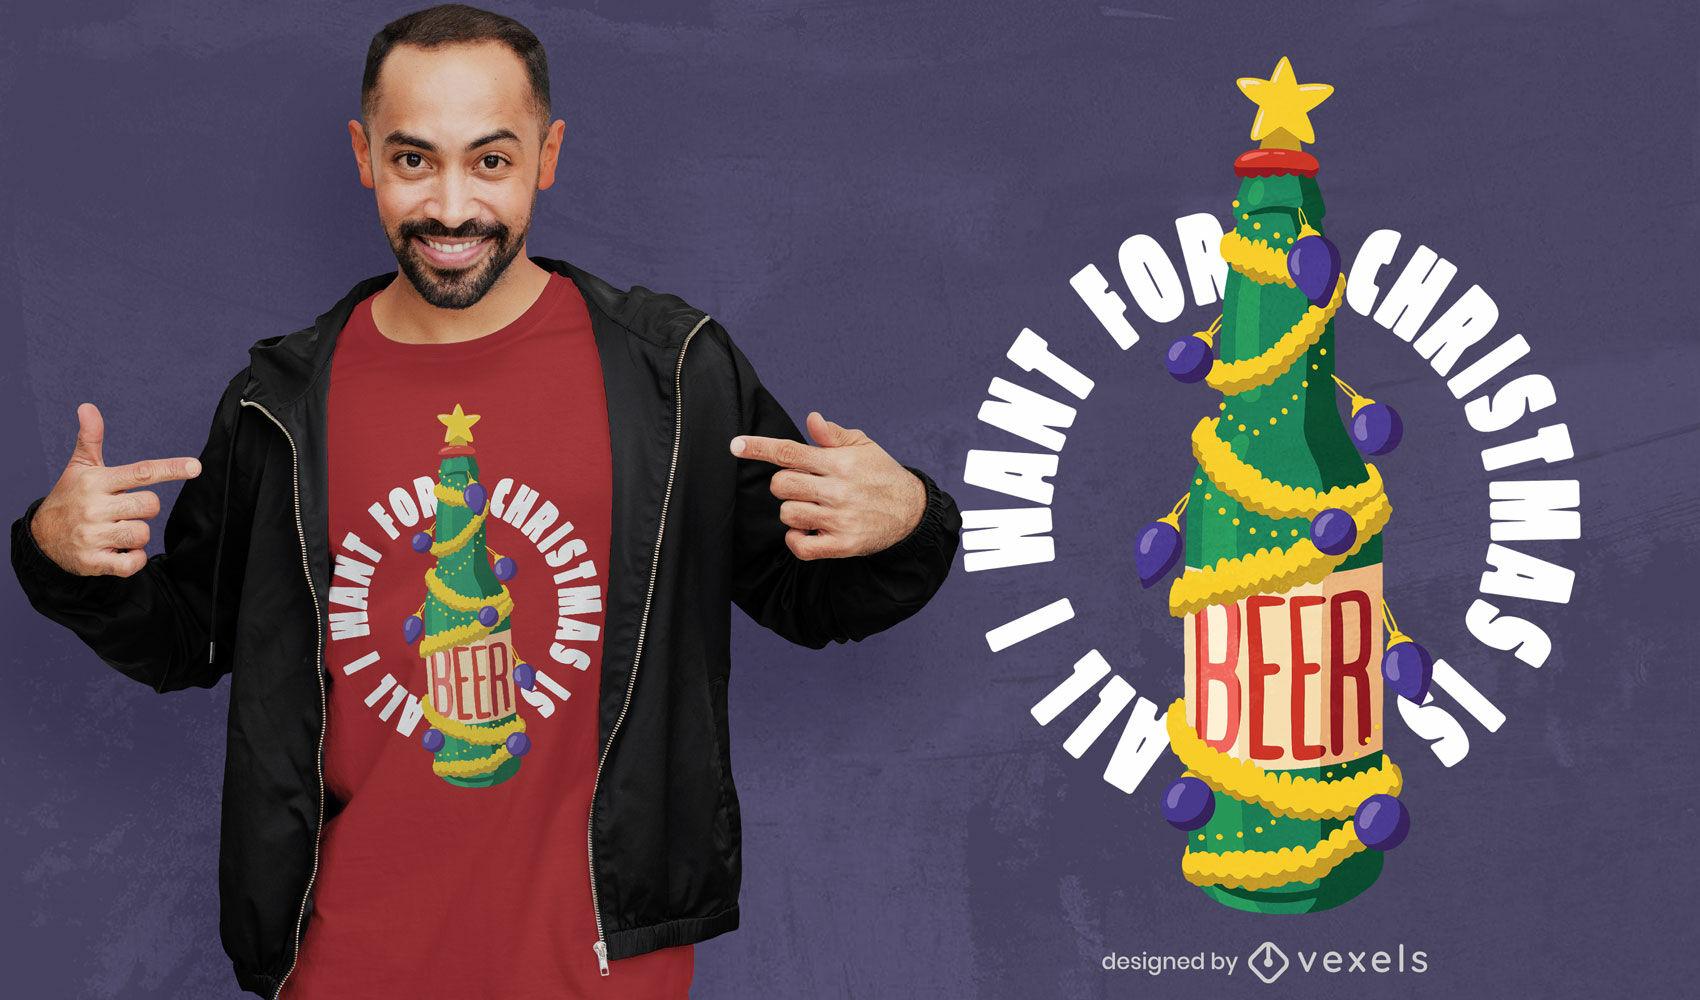 Christmas tree beer drink t-shirt design